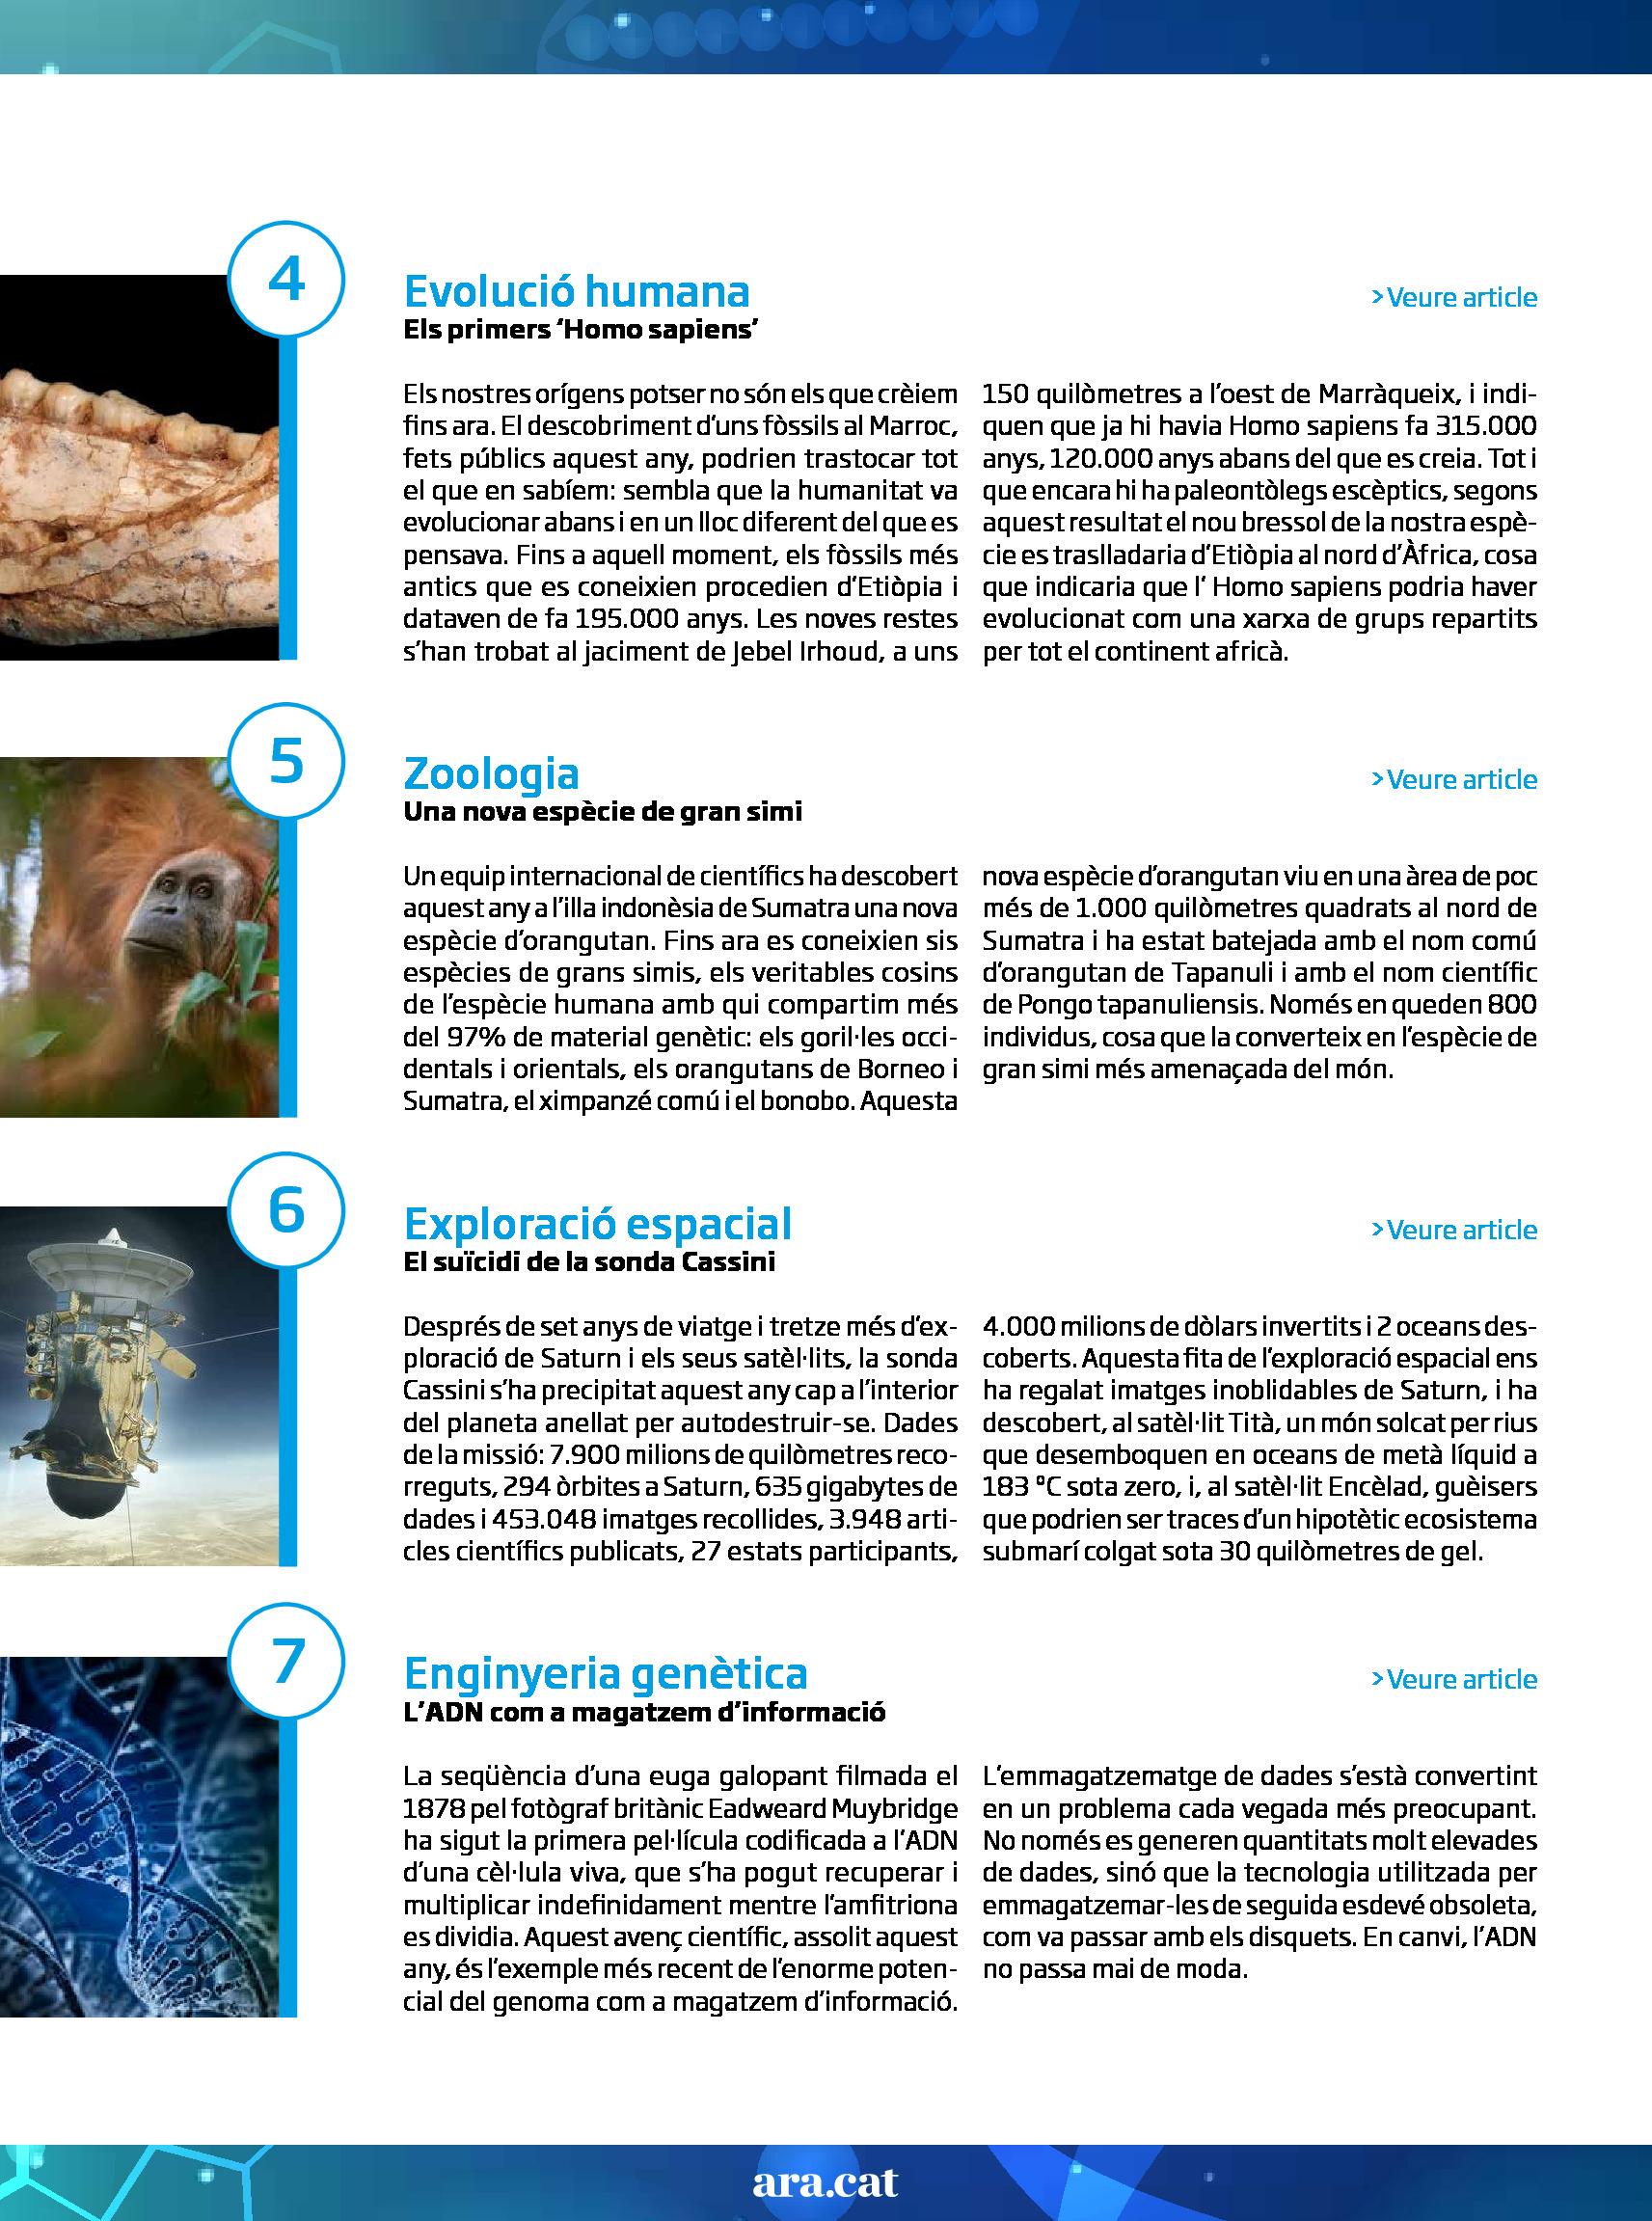 Les 10 troballes científiques del 2017 2